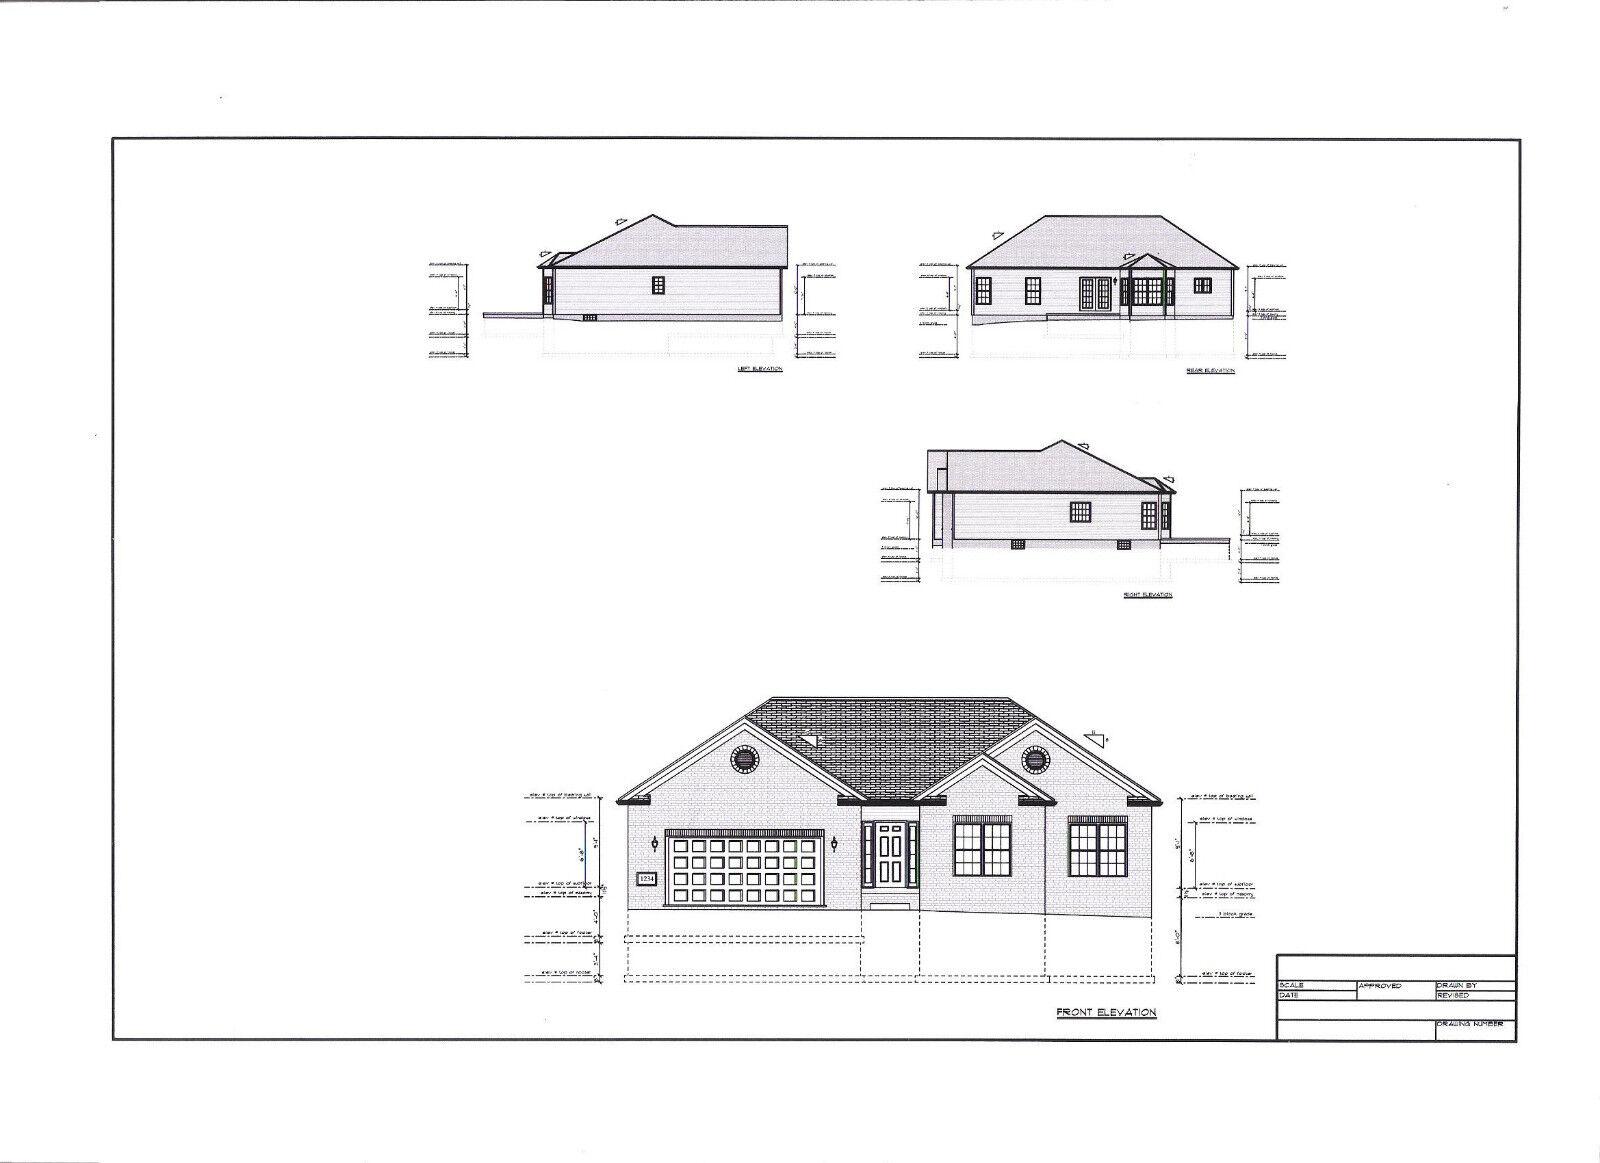 Full Set Of Single Story 3 Bedroom House Plans 1 776 Sq Ft For Sale Online Ebay,Home Design Credit Card